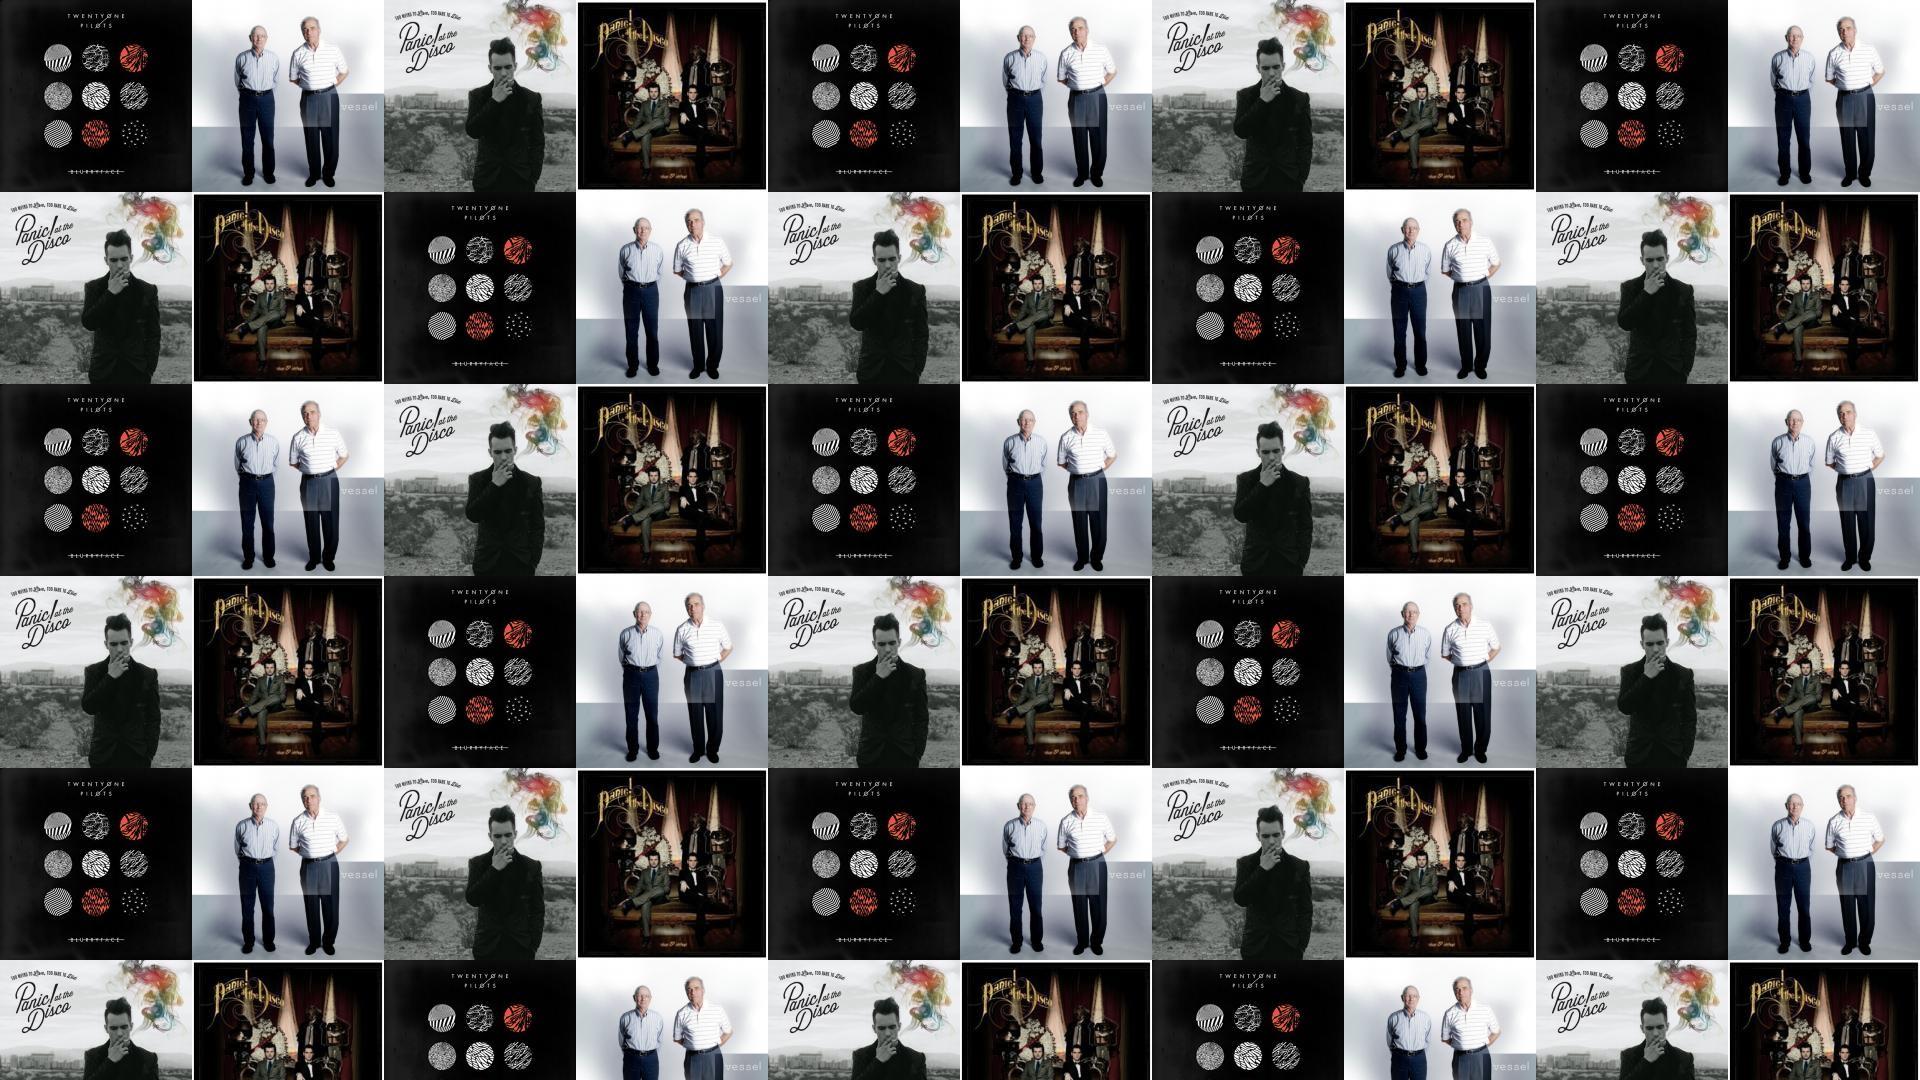 Twenty One Pilots Blurryface Vessel Panic At Disco Wallpaper Â« Tiled  Desktop Wallpaper